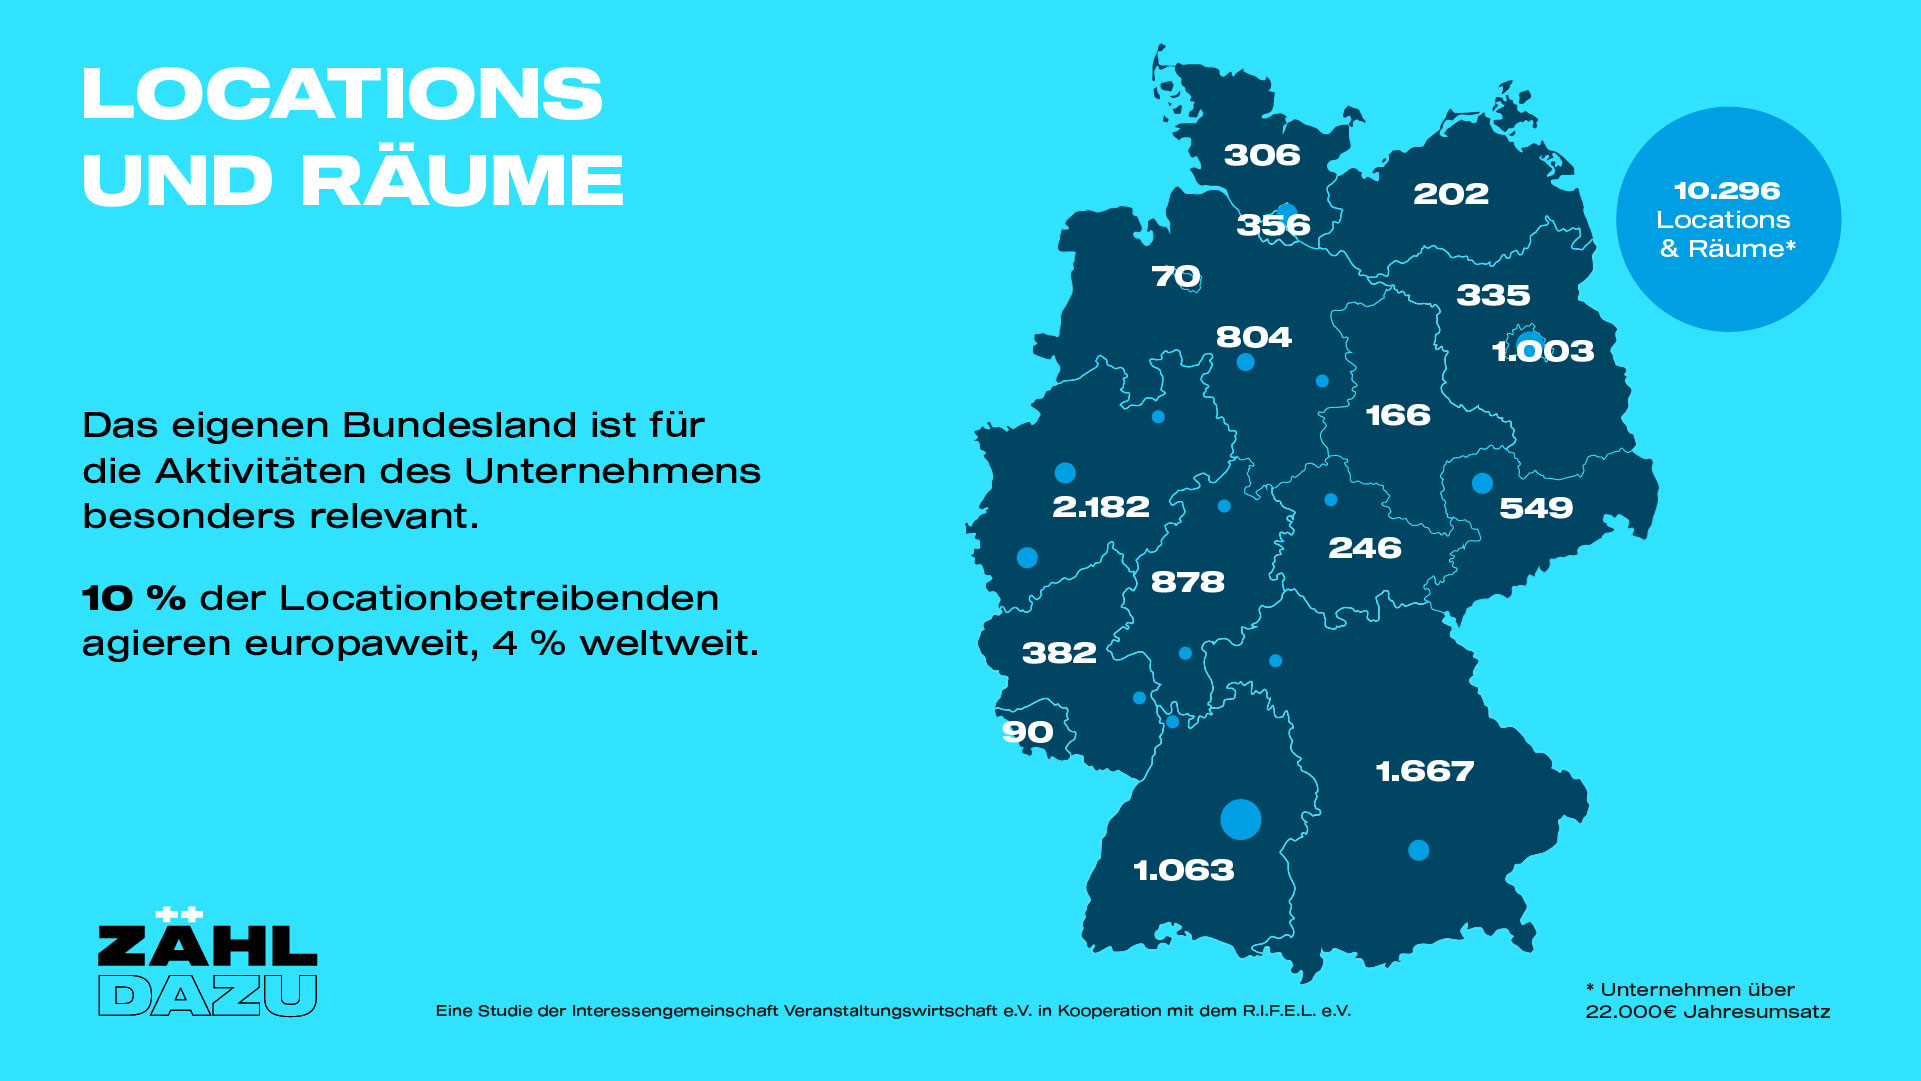 zaehl-dazu_Landkarte_Locations_Raeume_01